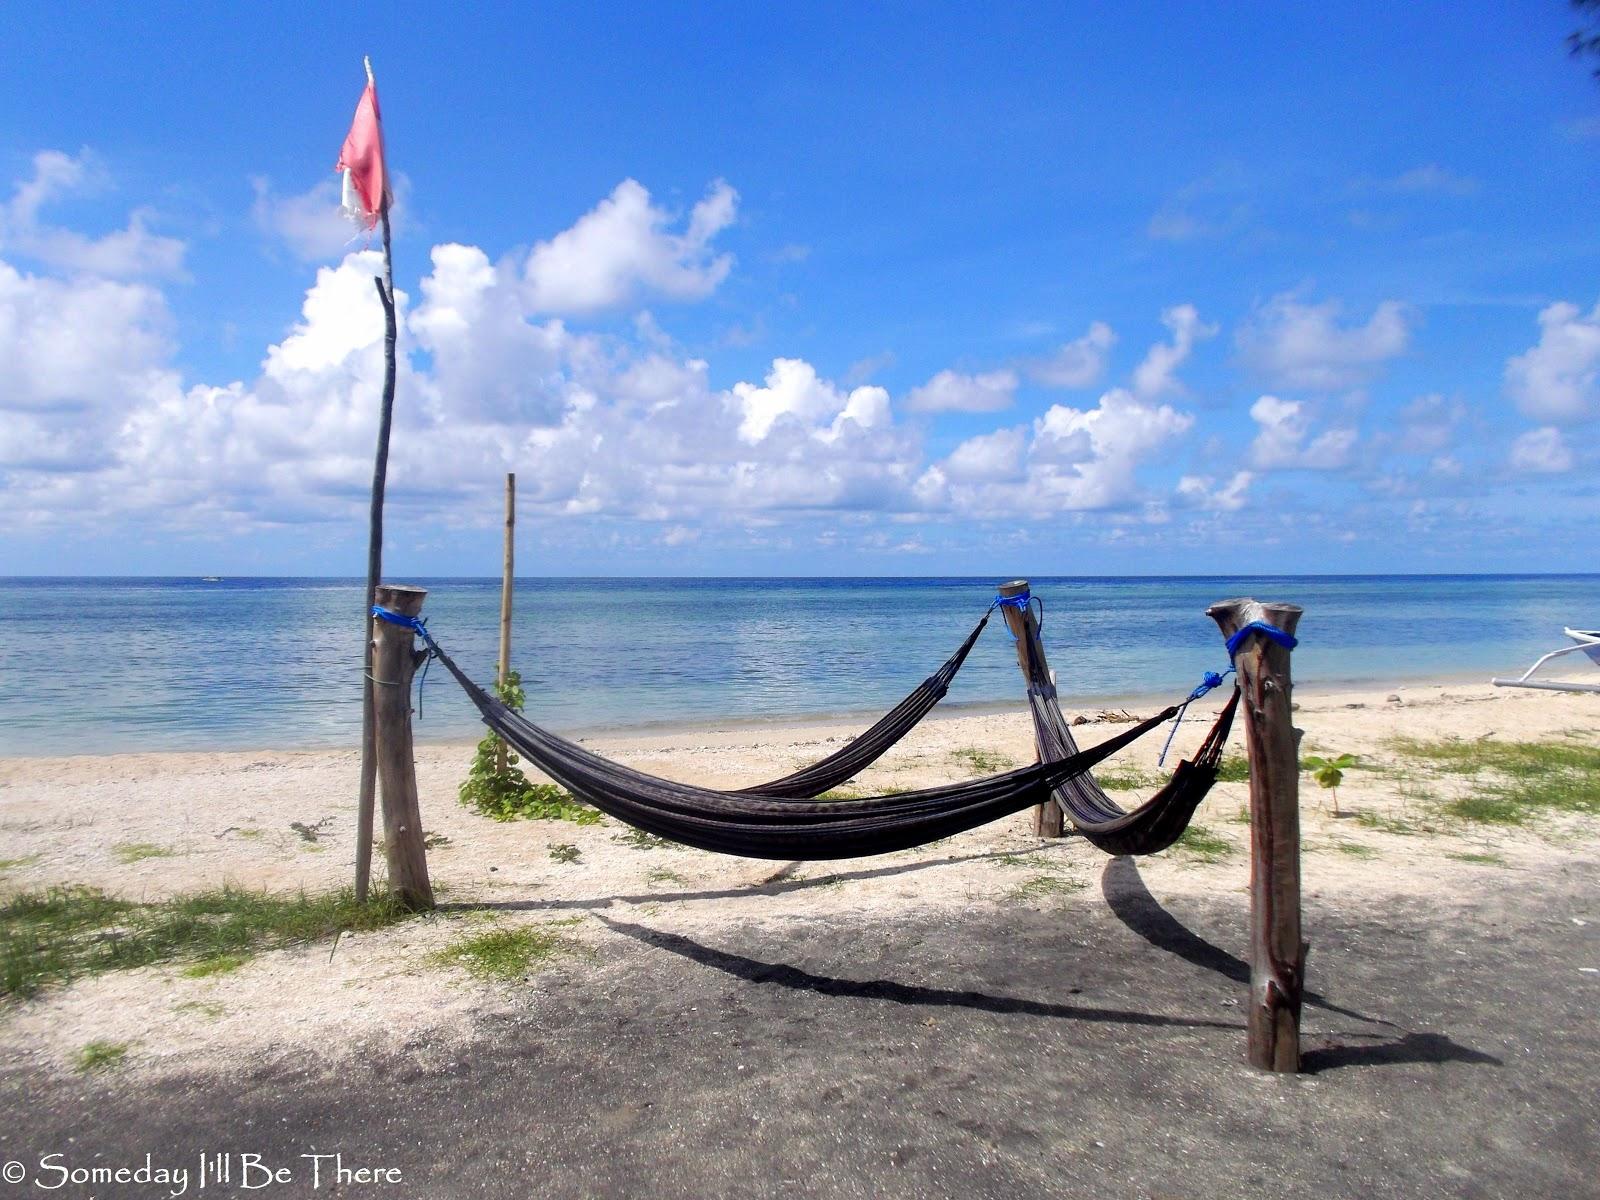 Tak Gili Trawangan 5 Pesona Alam Lombok Utara Air Pulau